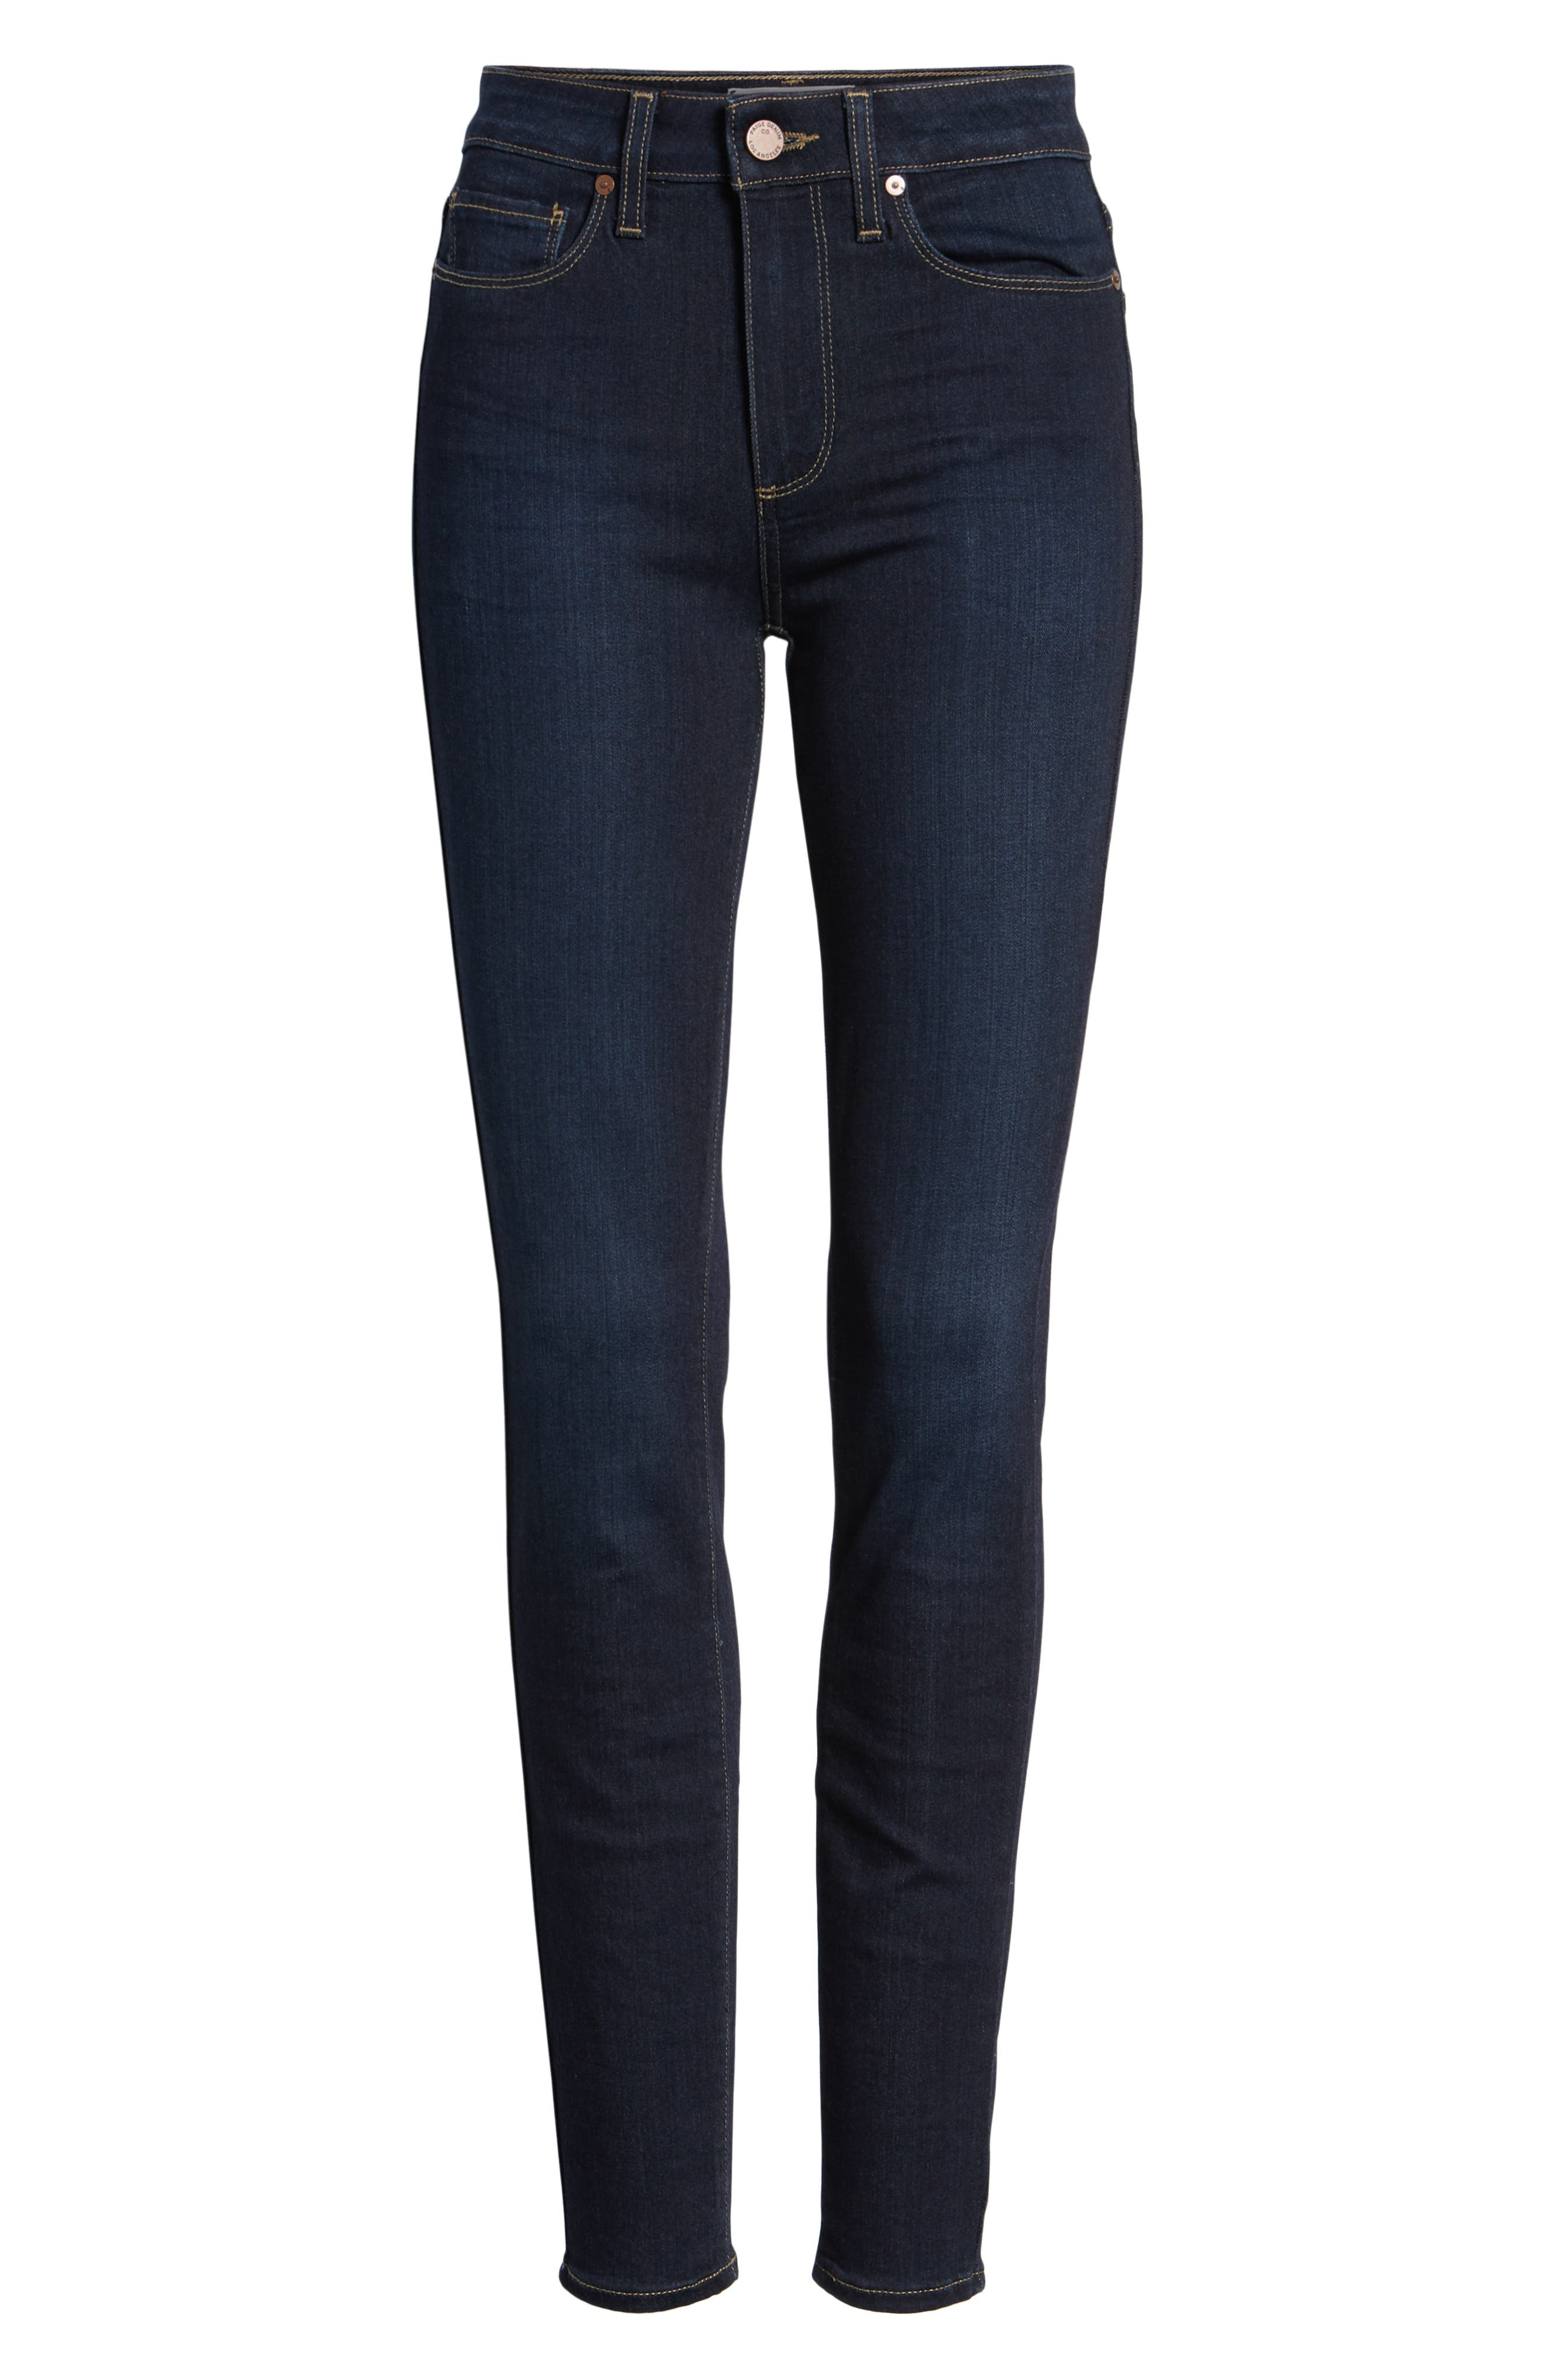 Transcend - Hoxton High Waist Ultra Skinny Jeans,                             Alternate thumbnail 7, color,                             SANIA